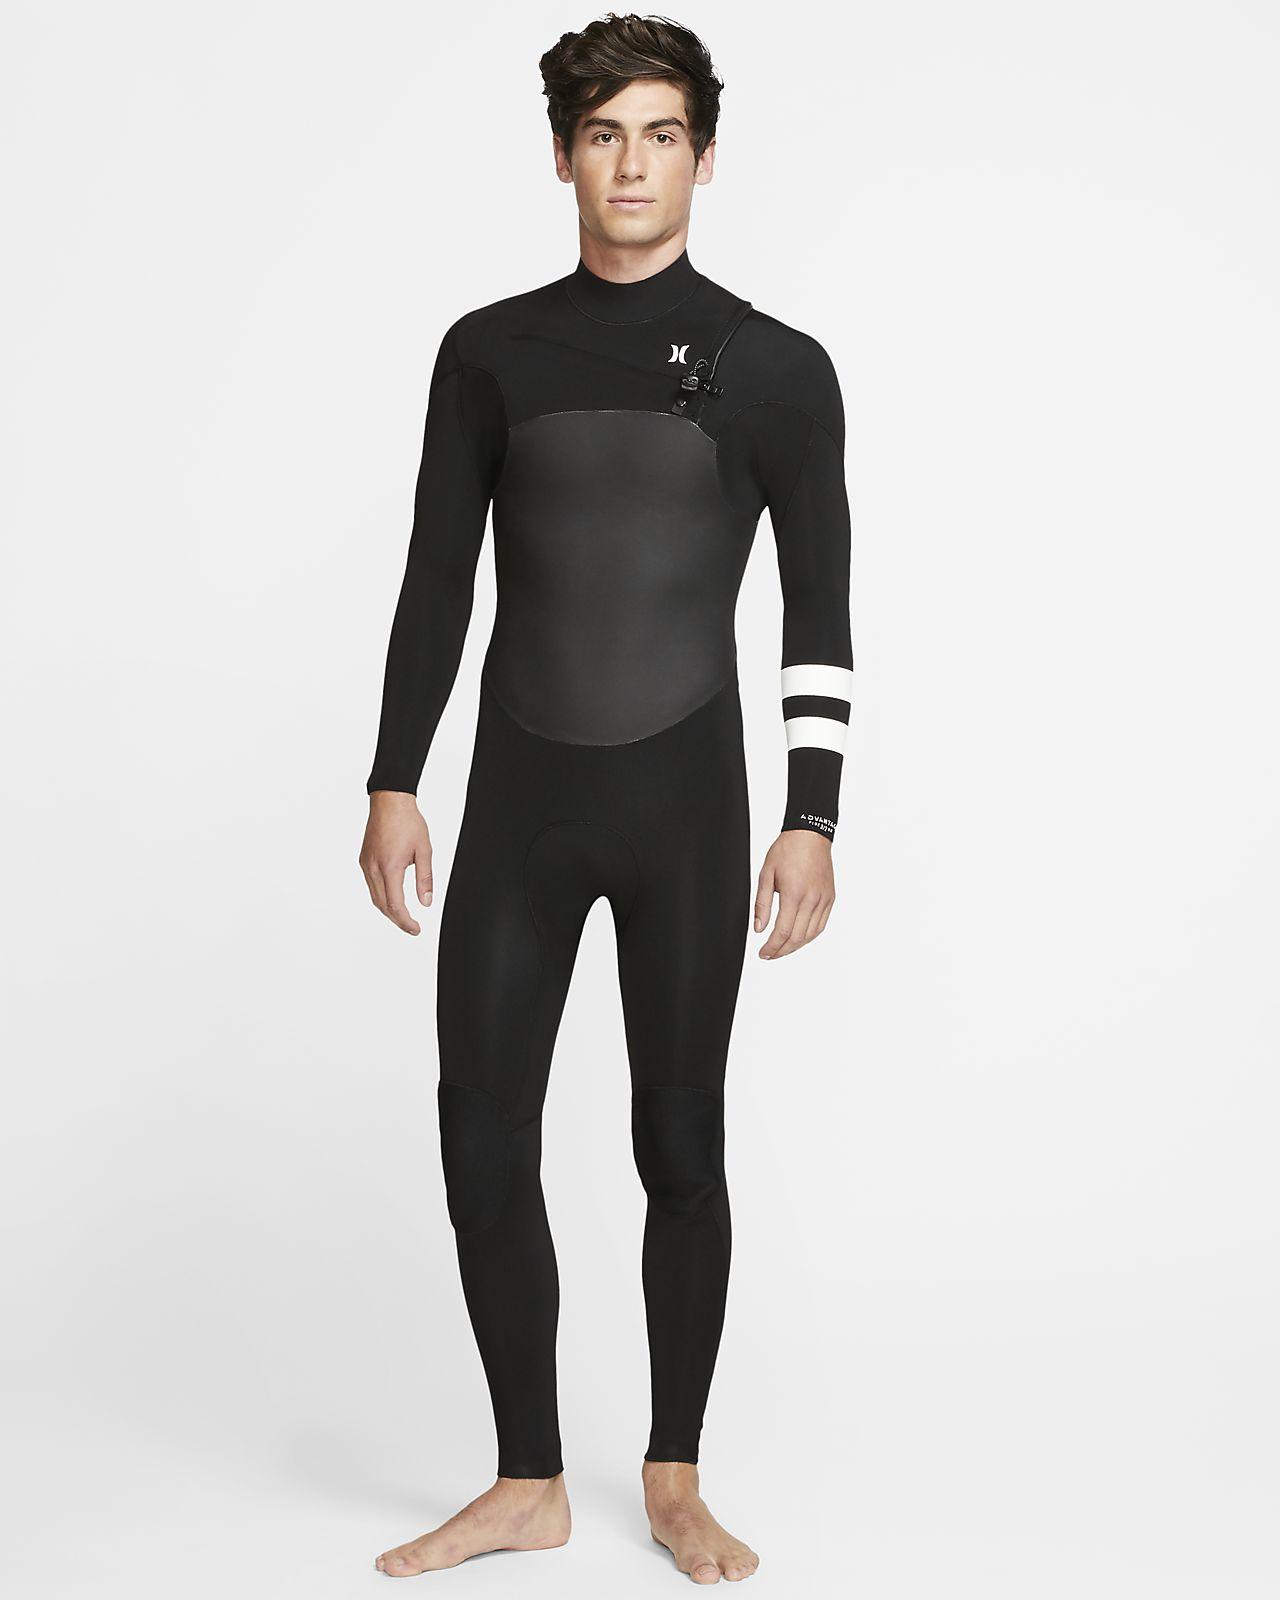 Hurley Advantage Plus 3/2mm Fullsuit Erkek Wetsuit'i